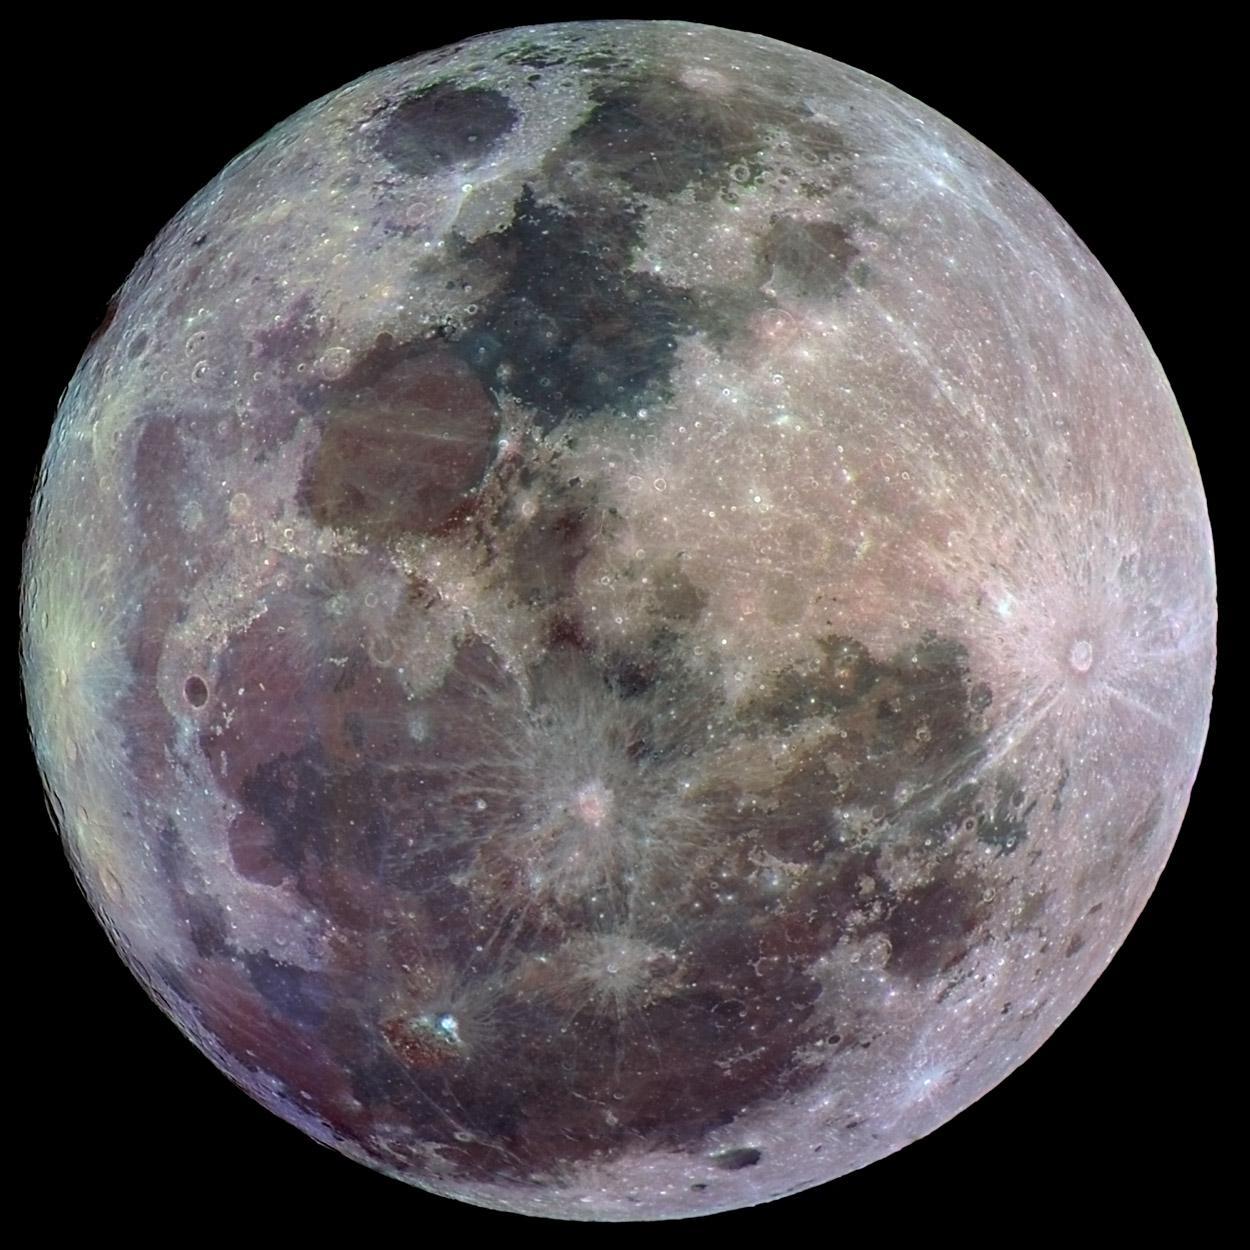 lune.jpg (Image JPEG, 1250x1250 pixels) - Redimensionnée (61%)